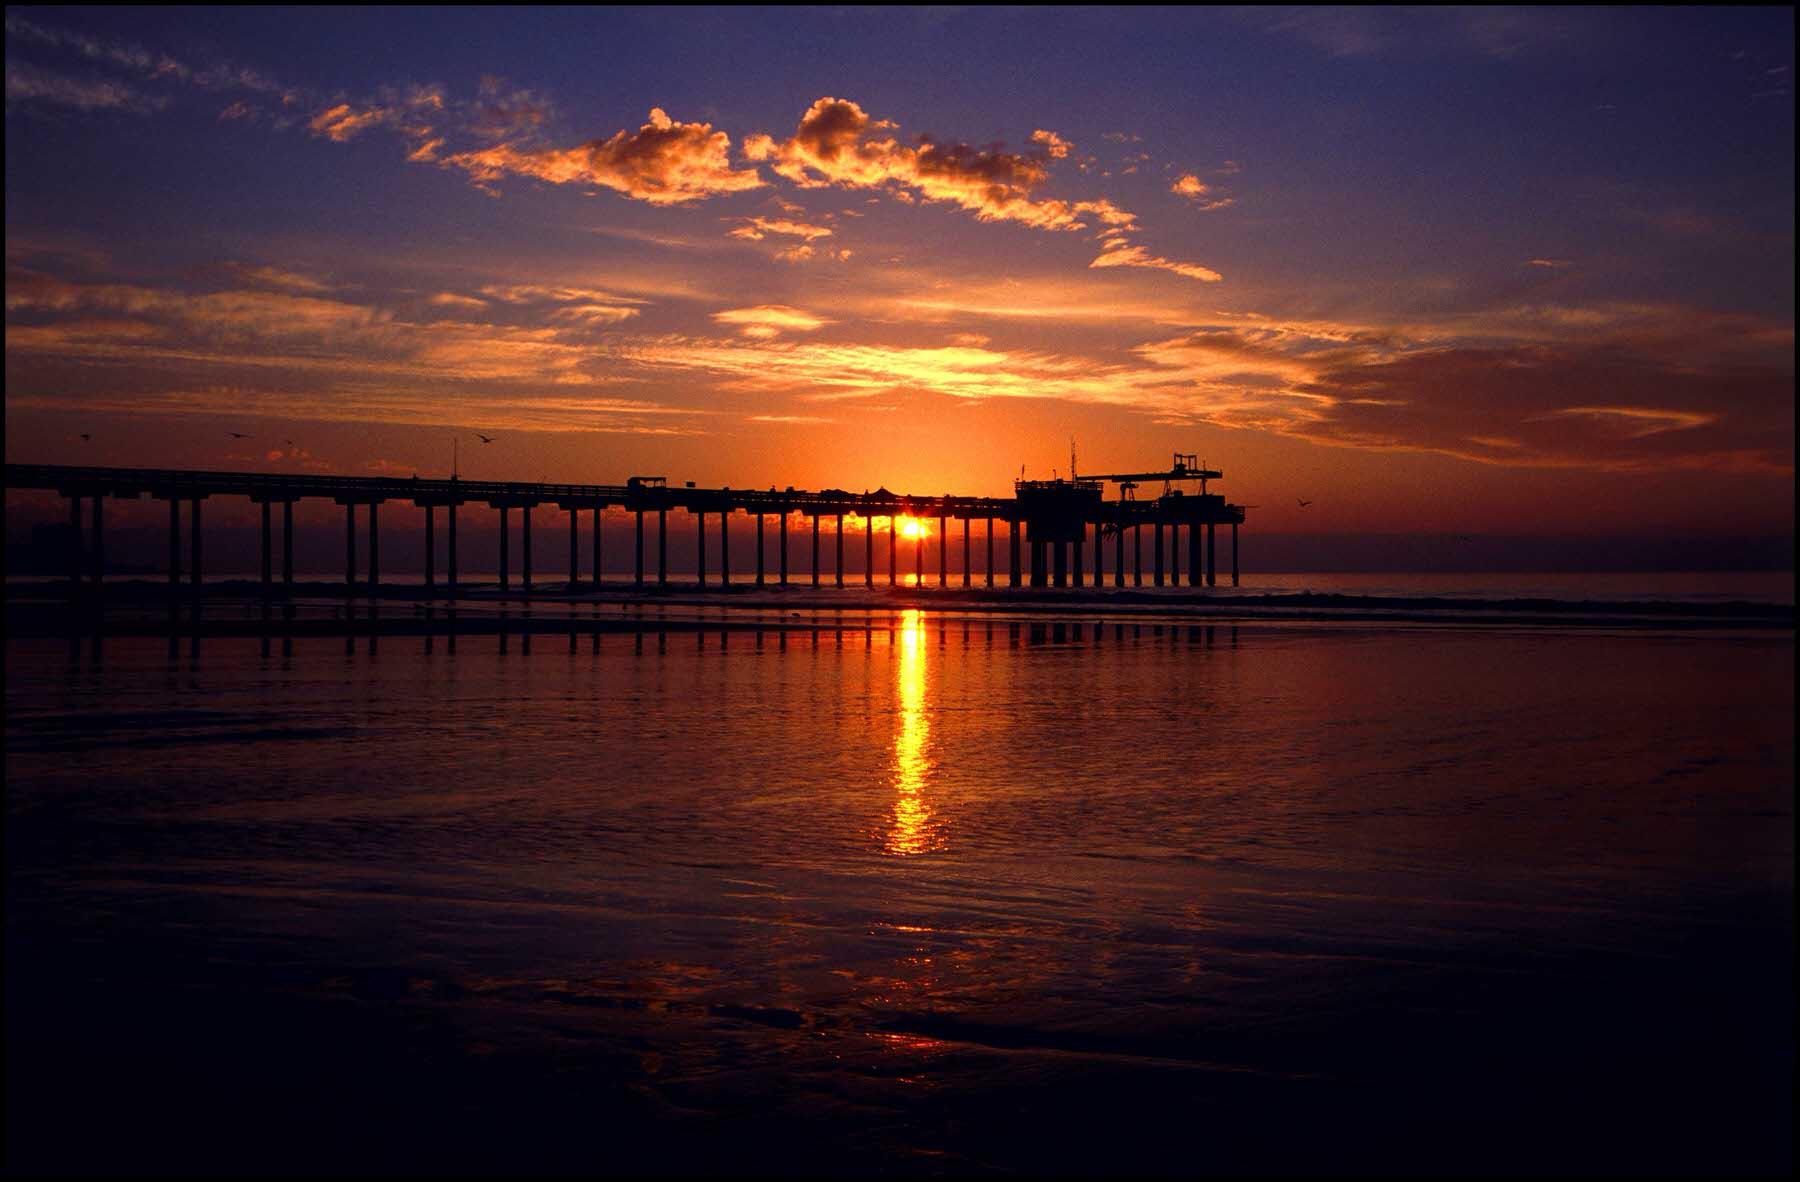 Scripps_Pier_Sunset.jpg